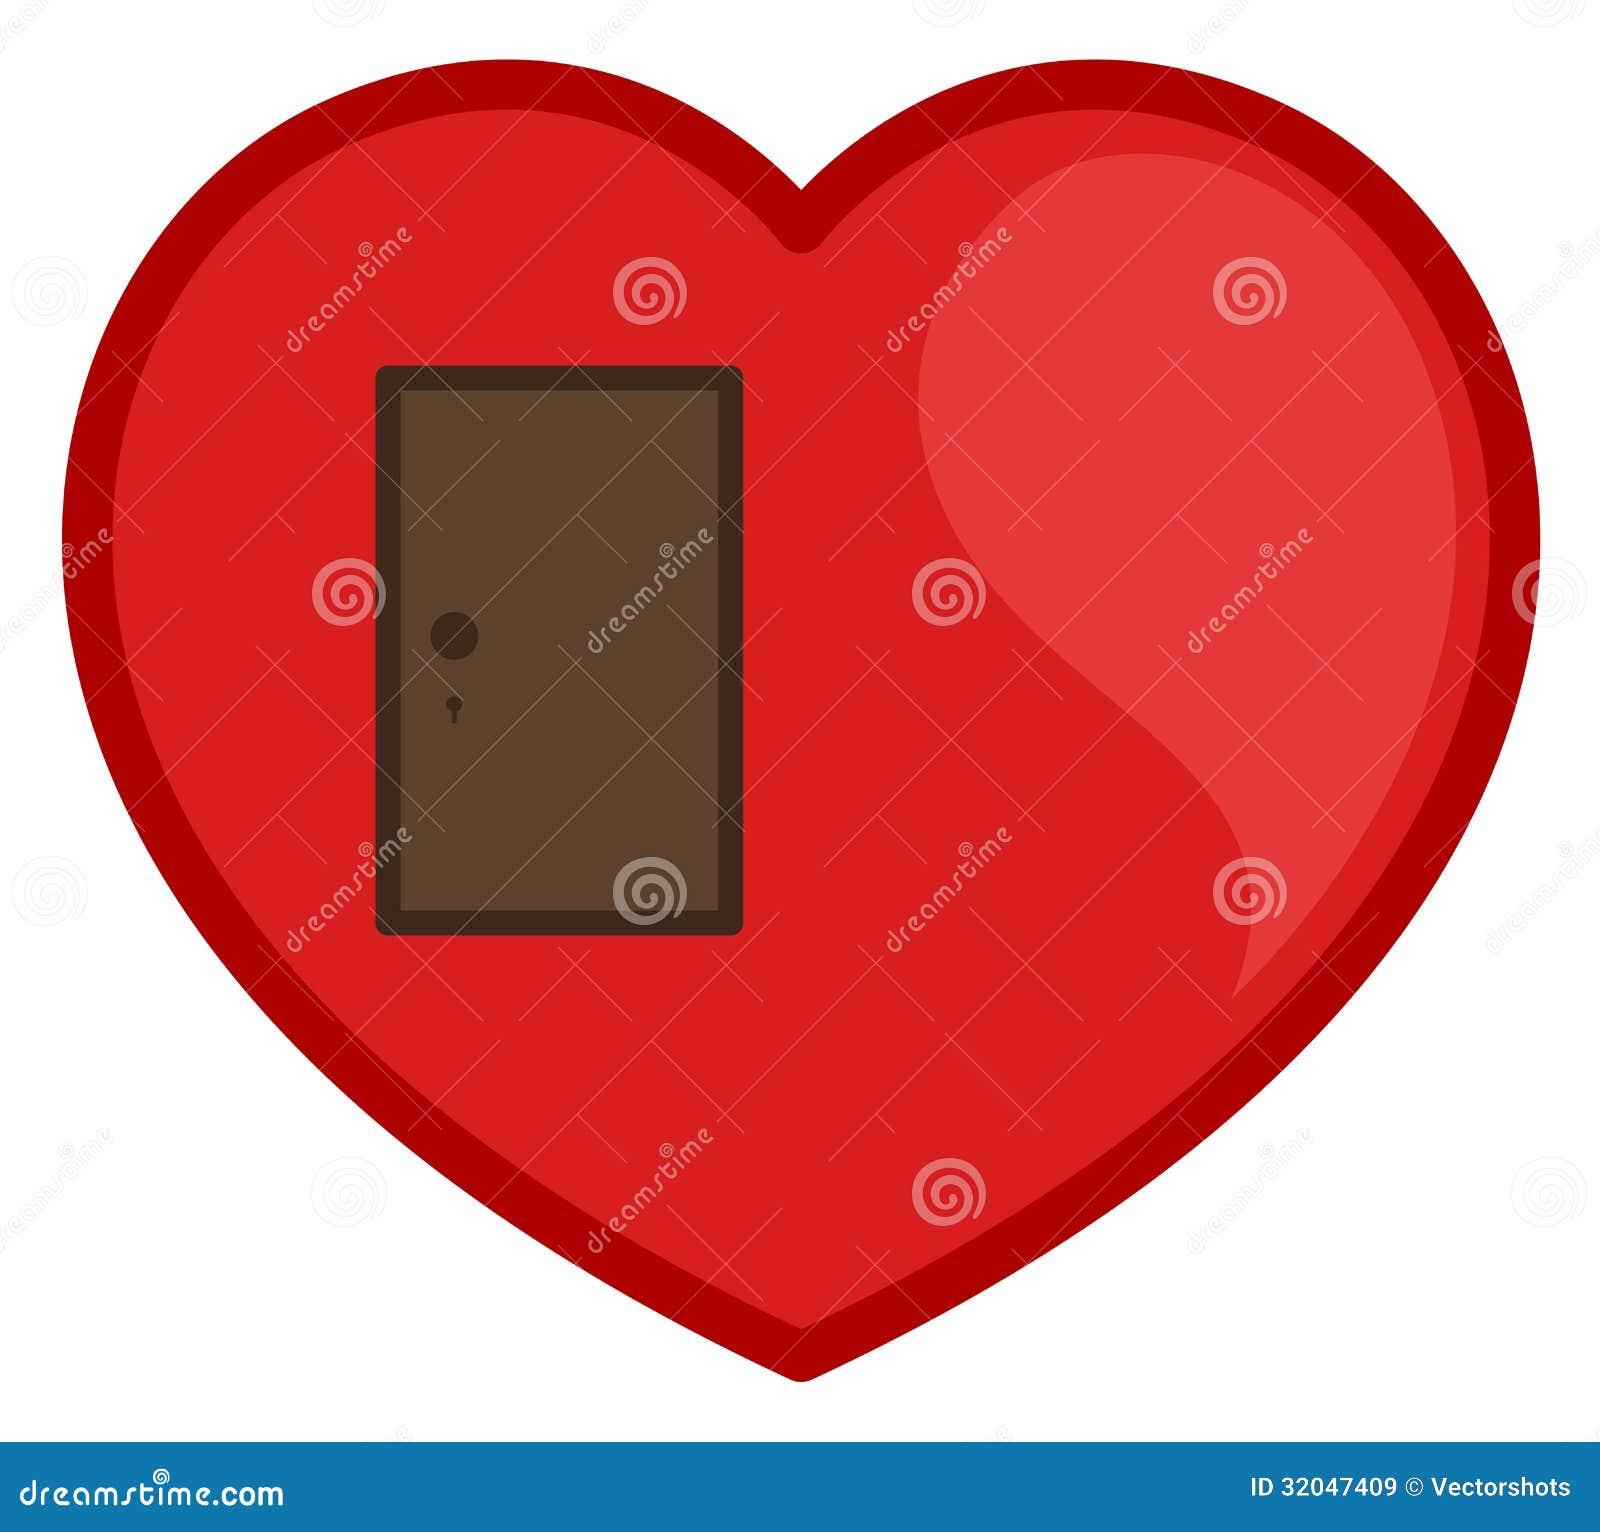 Closed Door Drawing closed door heart vector royalty free stock images - image: 32047409